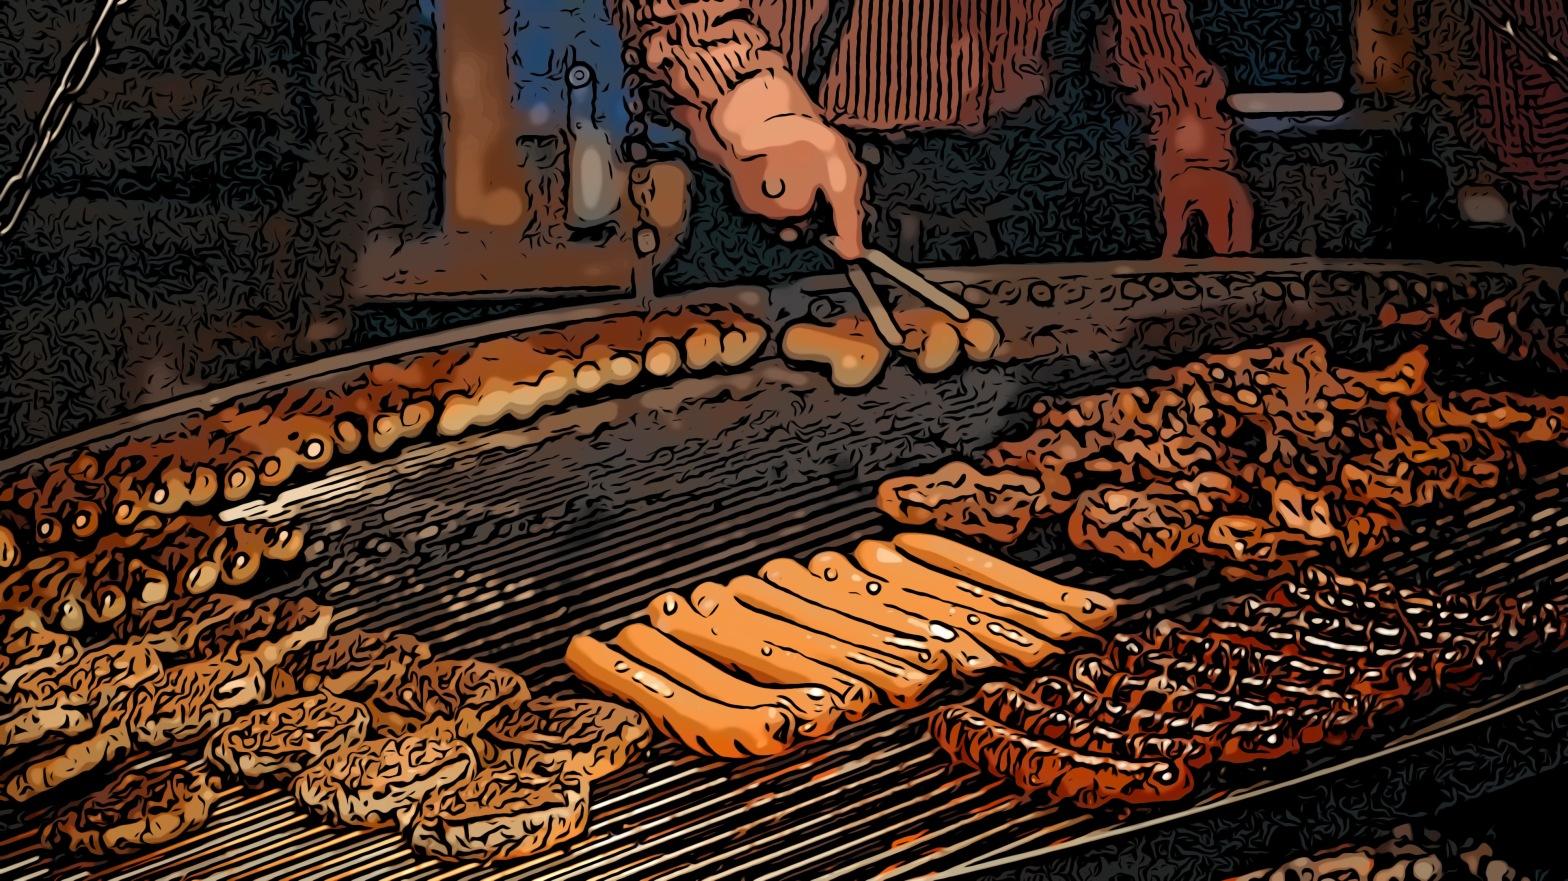 Hotdogs header comic